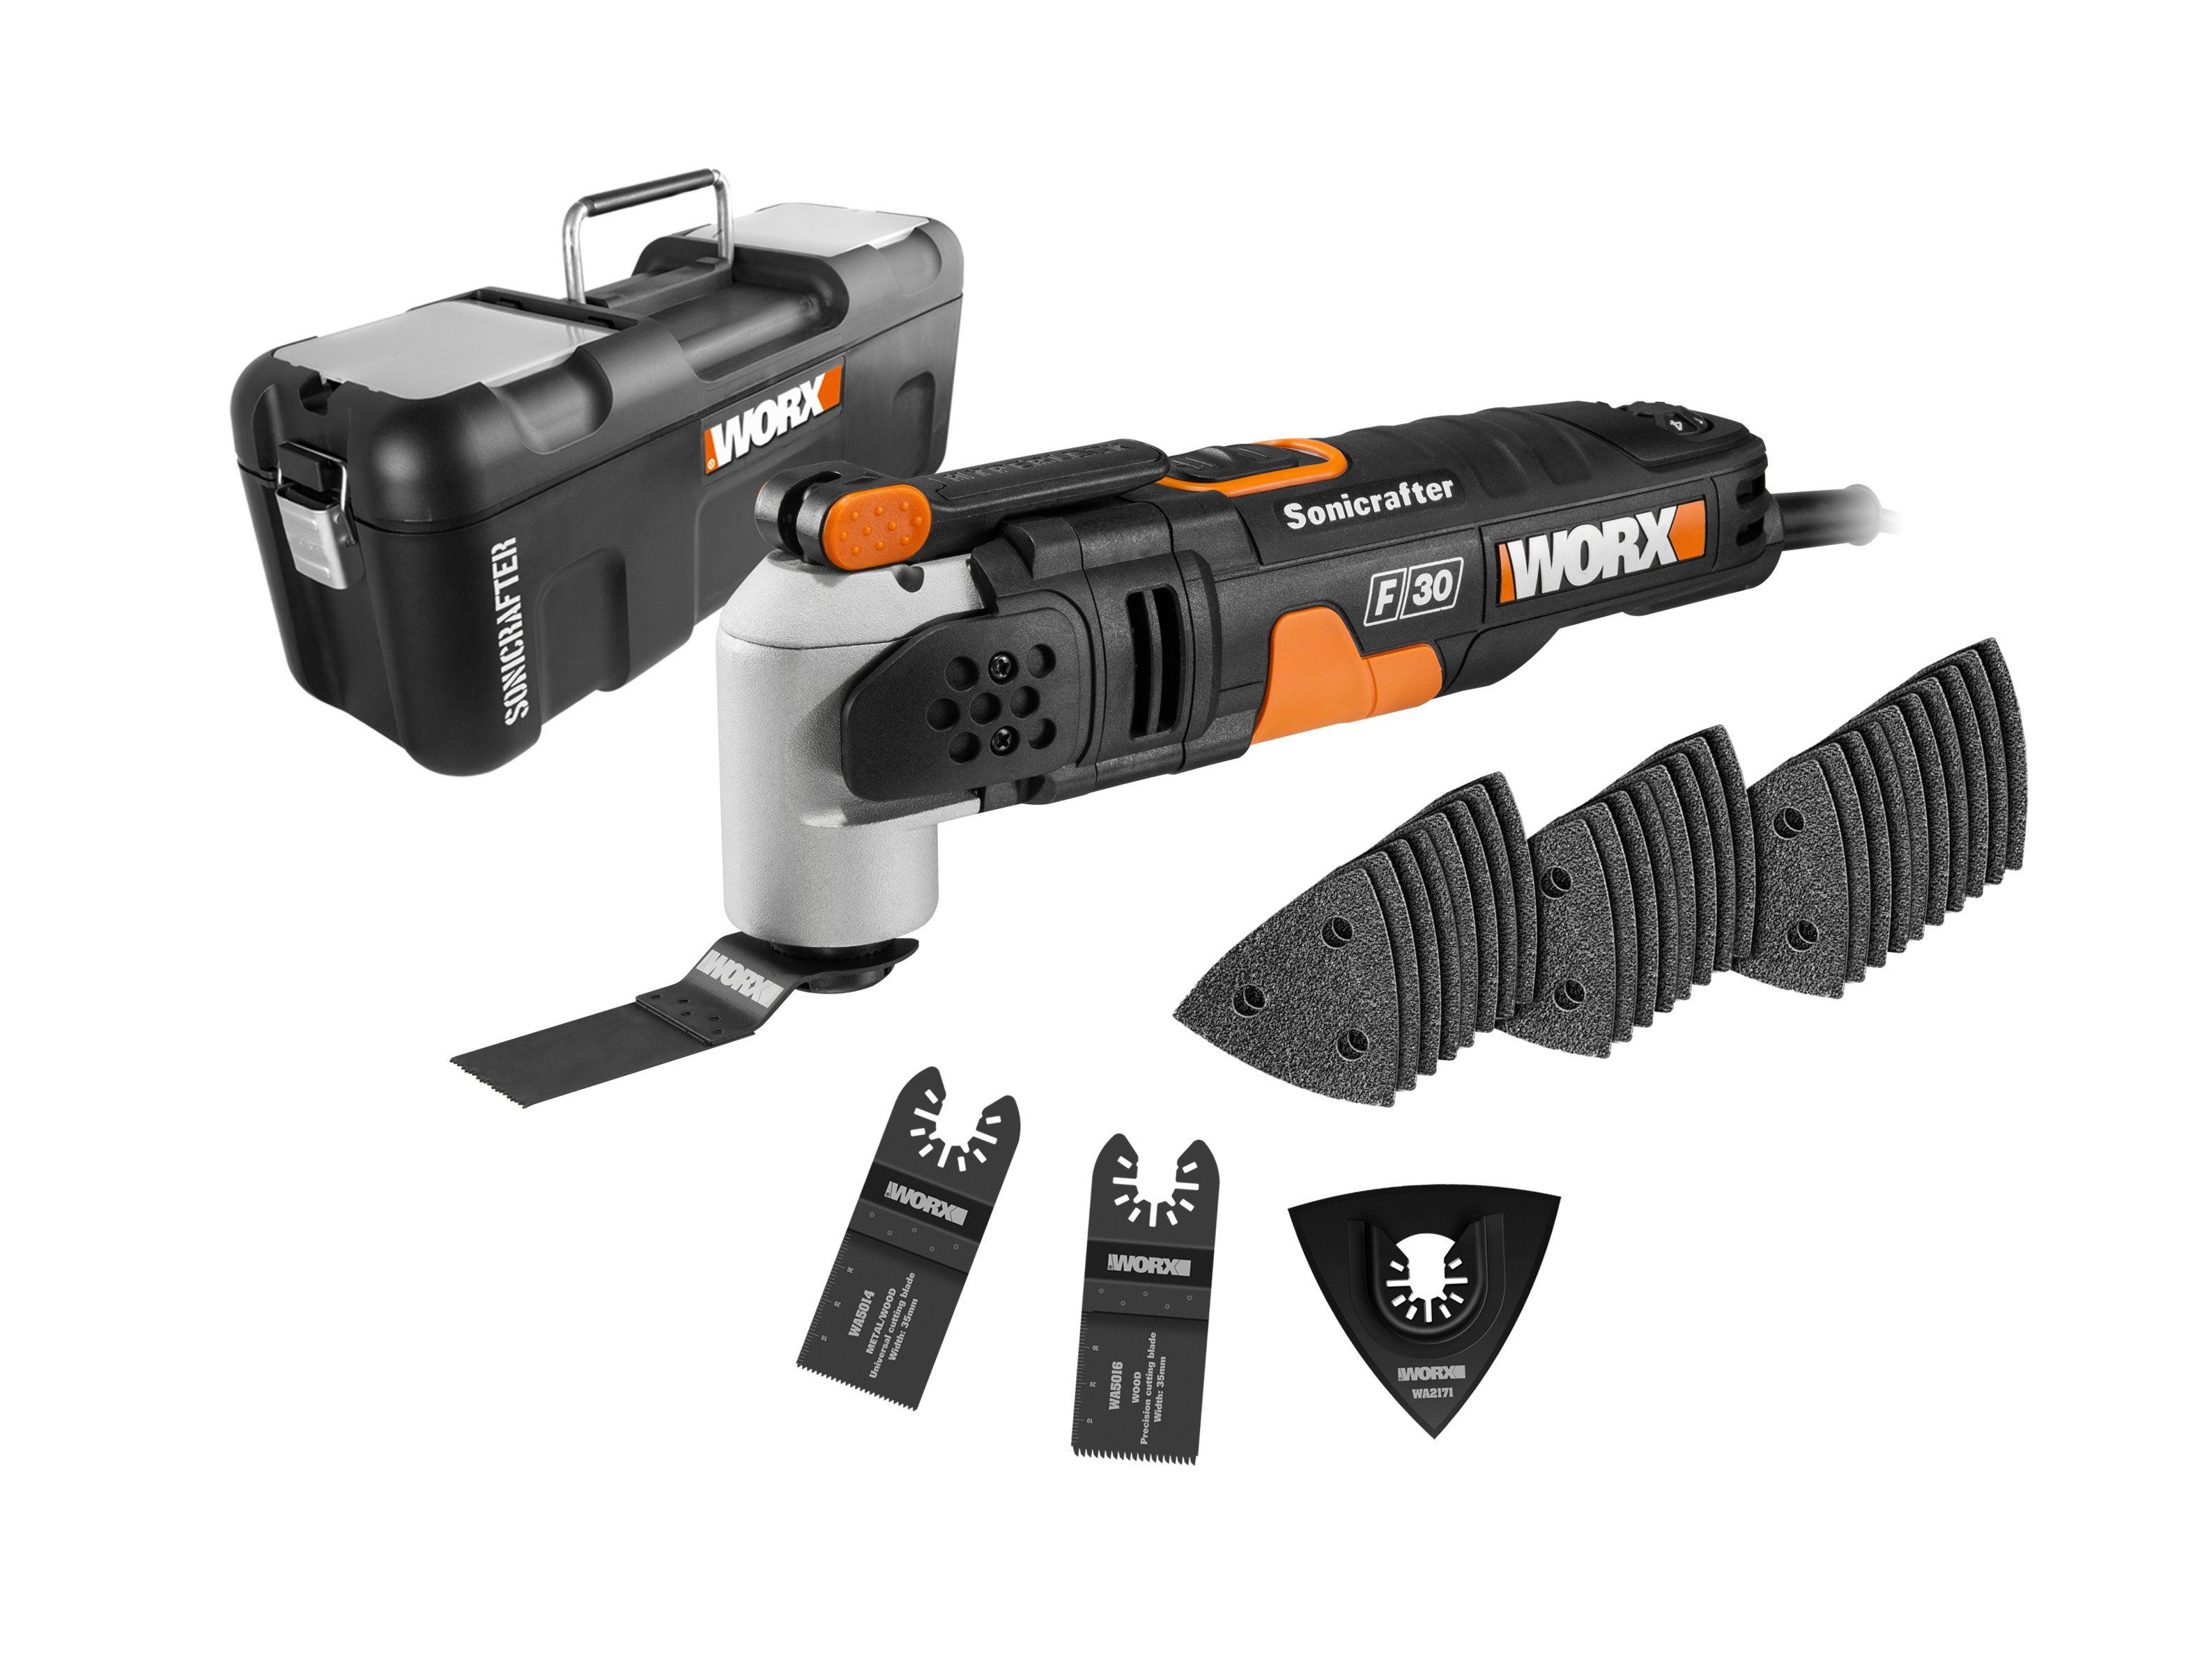 Worx Multifunktionswerkzeug »WX680 / Sonicrafter F30«